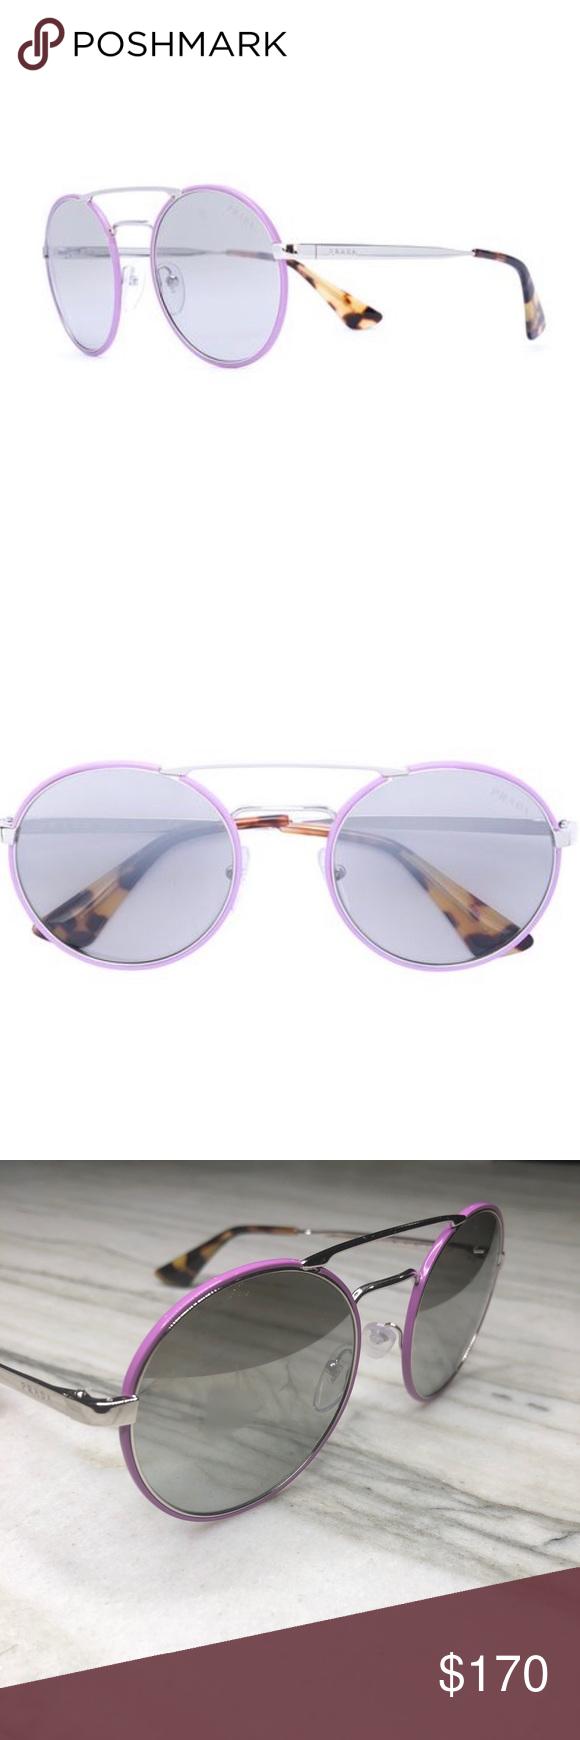 fcccf3c65c NWT Prada Cinema round wire frame sunglasses NWT Prada Cinema round  sunglasses Violet Cinema round sunglasses